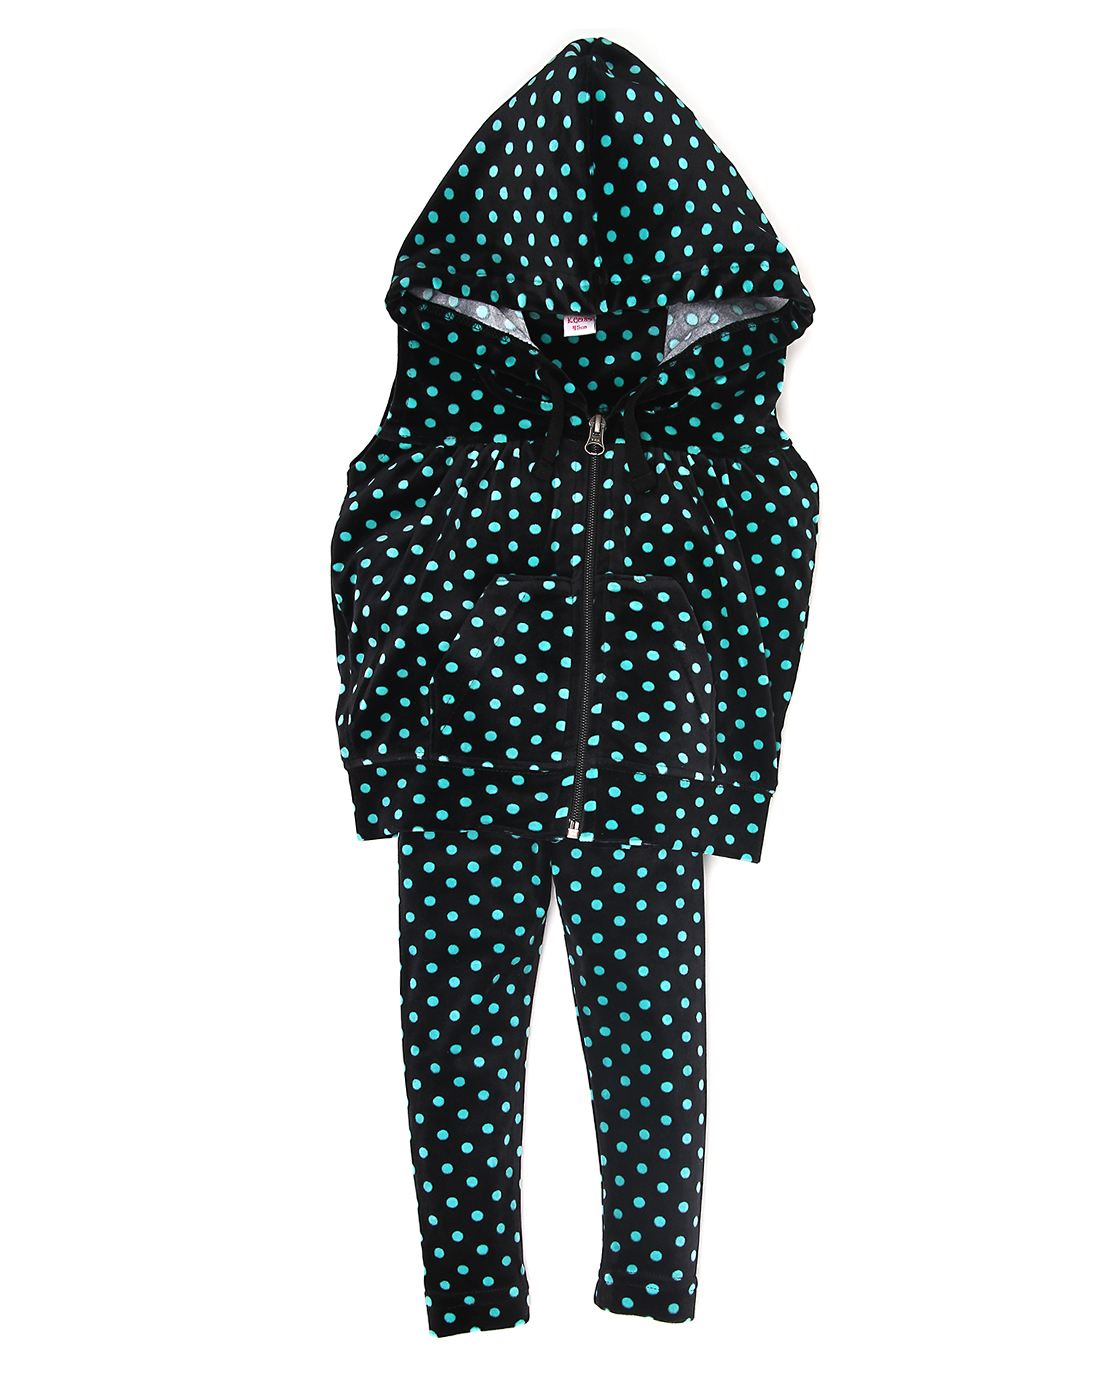 K.C.O 89 Girls Casual Polka Print Sleeveless Track Suit